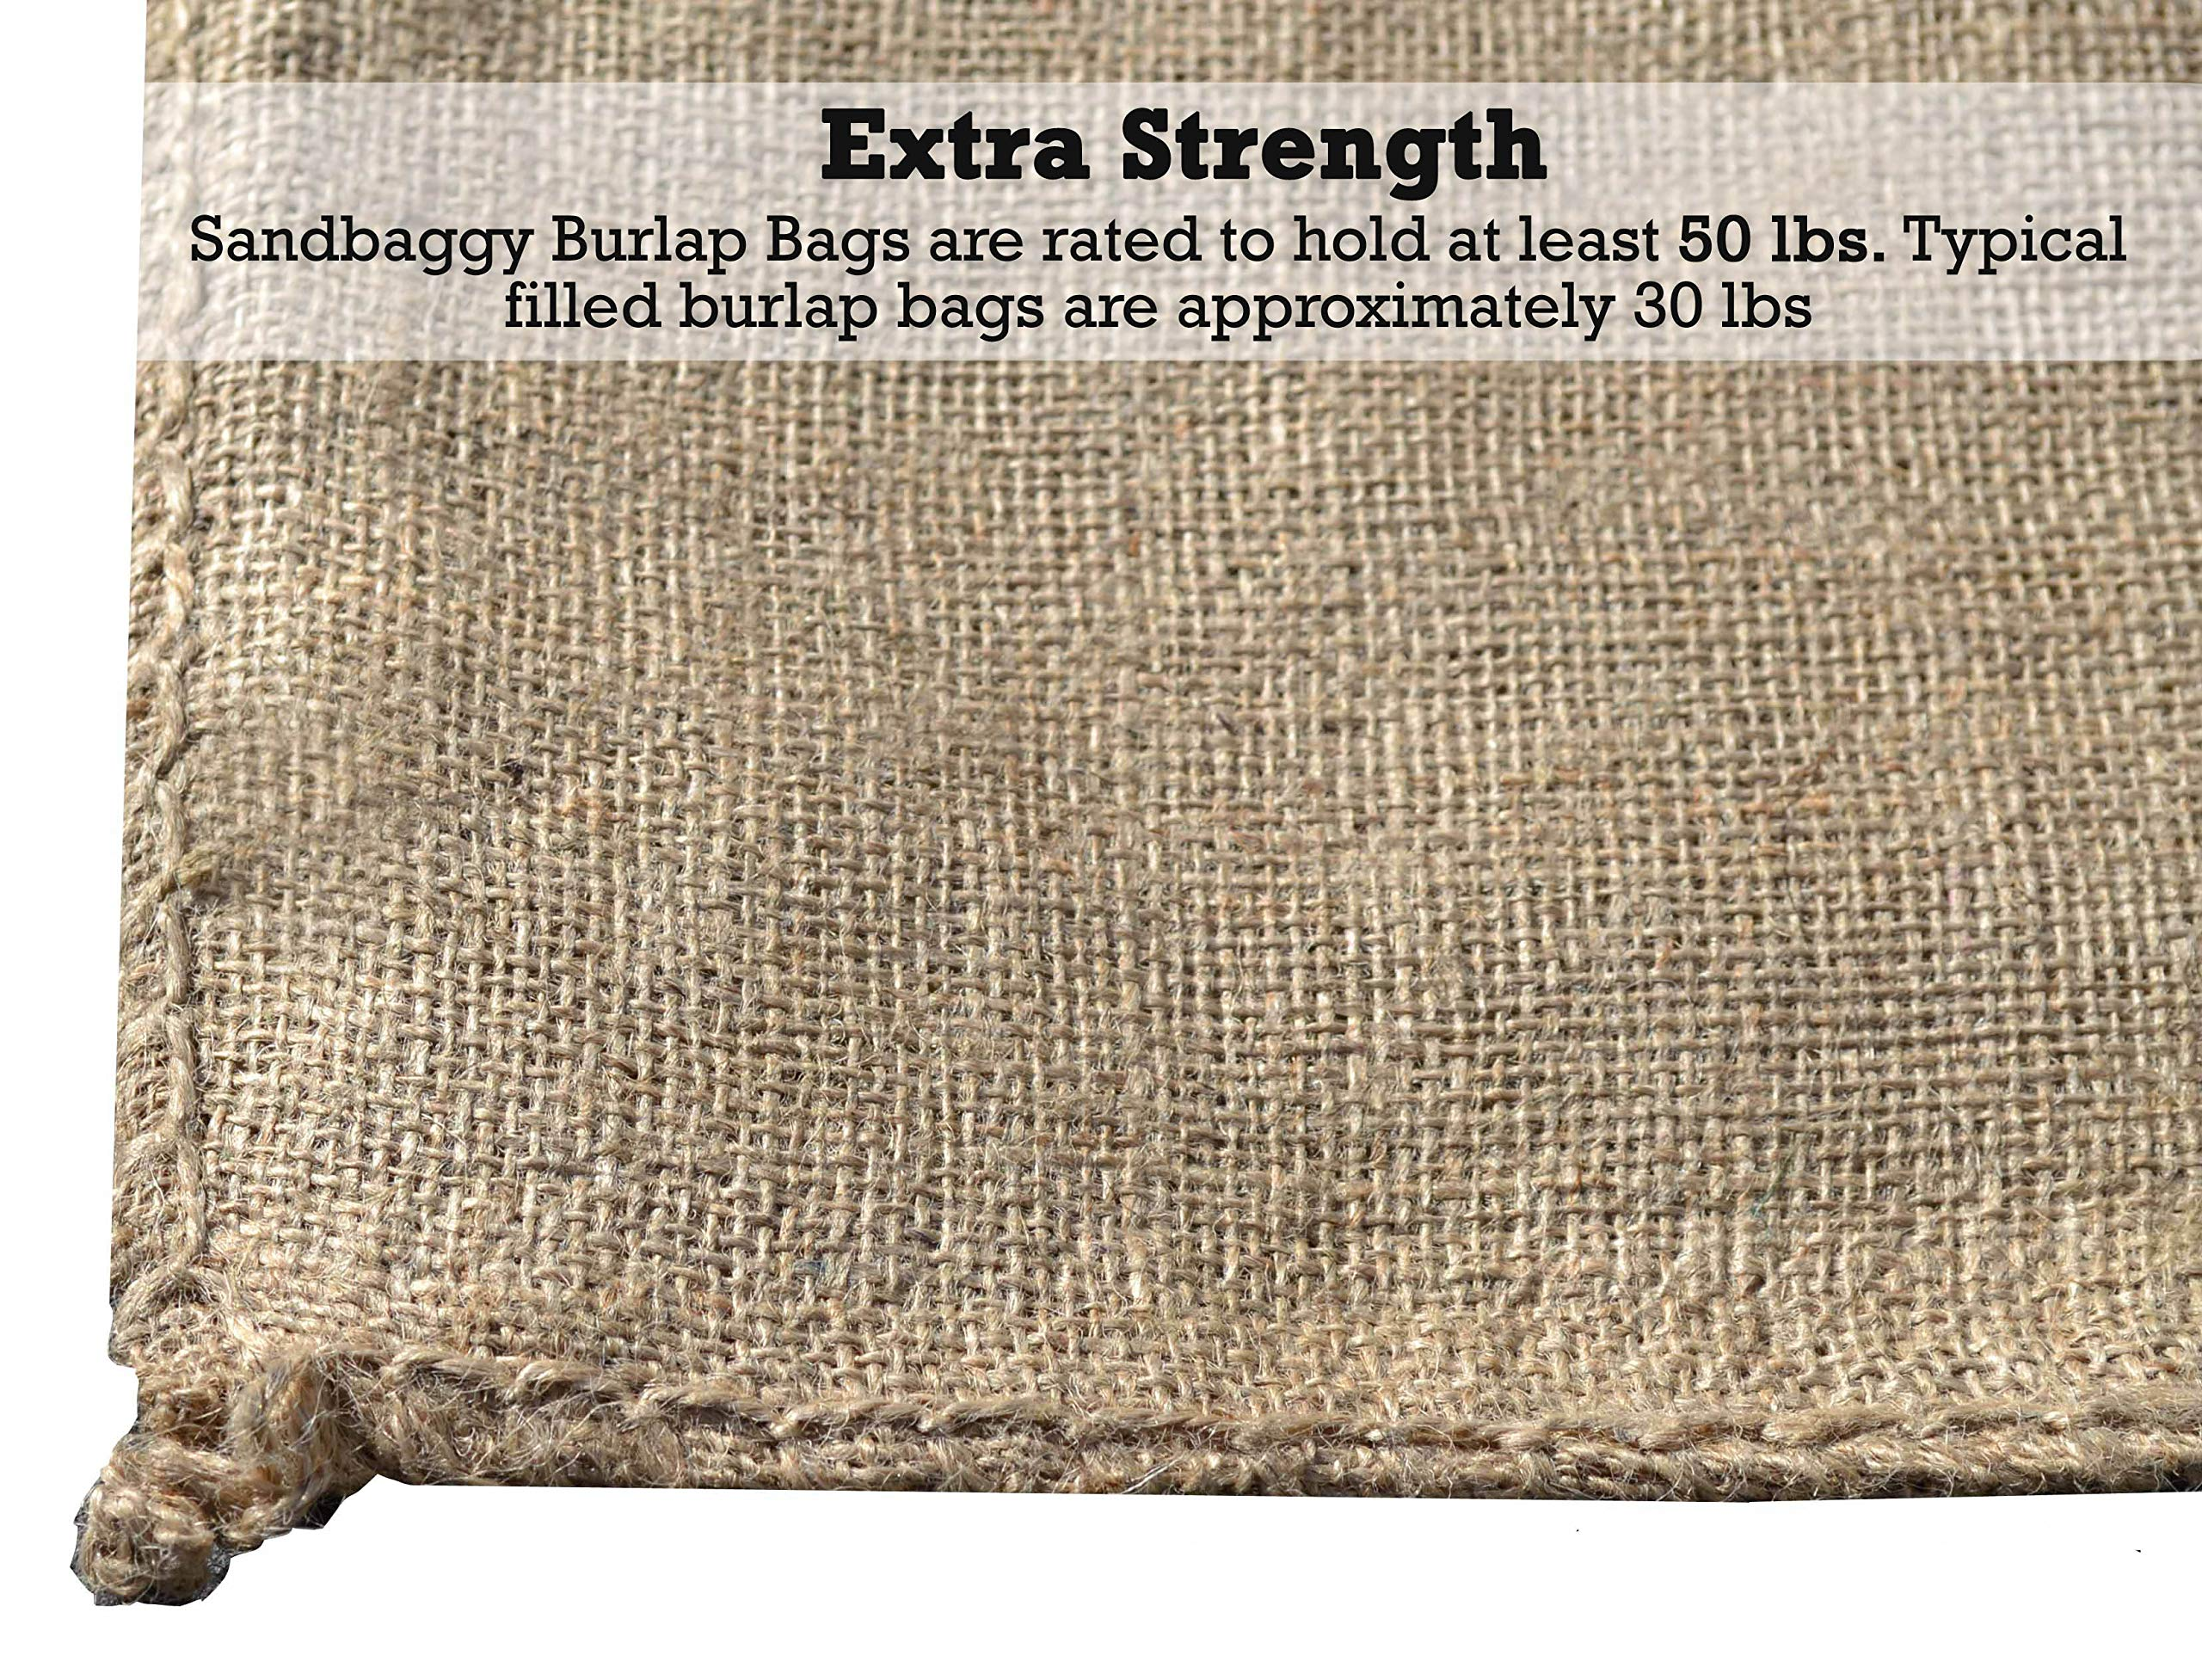 Sandbaggy Burlap Sand Bag - Size: 14'' x 26'' - Sandbags 50lb Weight Capacity - Sandbags for Flooding - Sand Bag - Flood Water Barrier - Water Curb - Tent Sandbags - Store Bags (5 Bags) by Sandbaggy (Image #3)